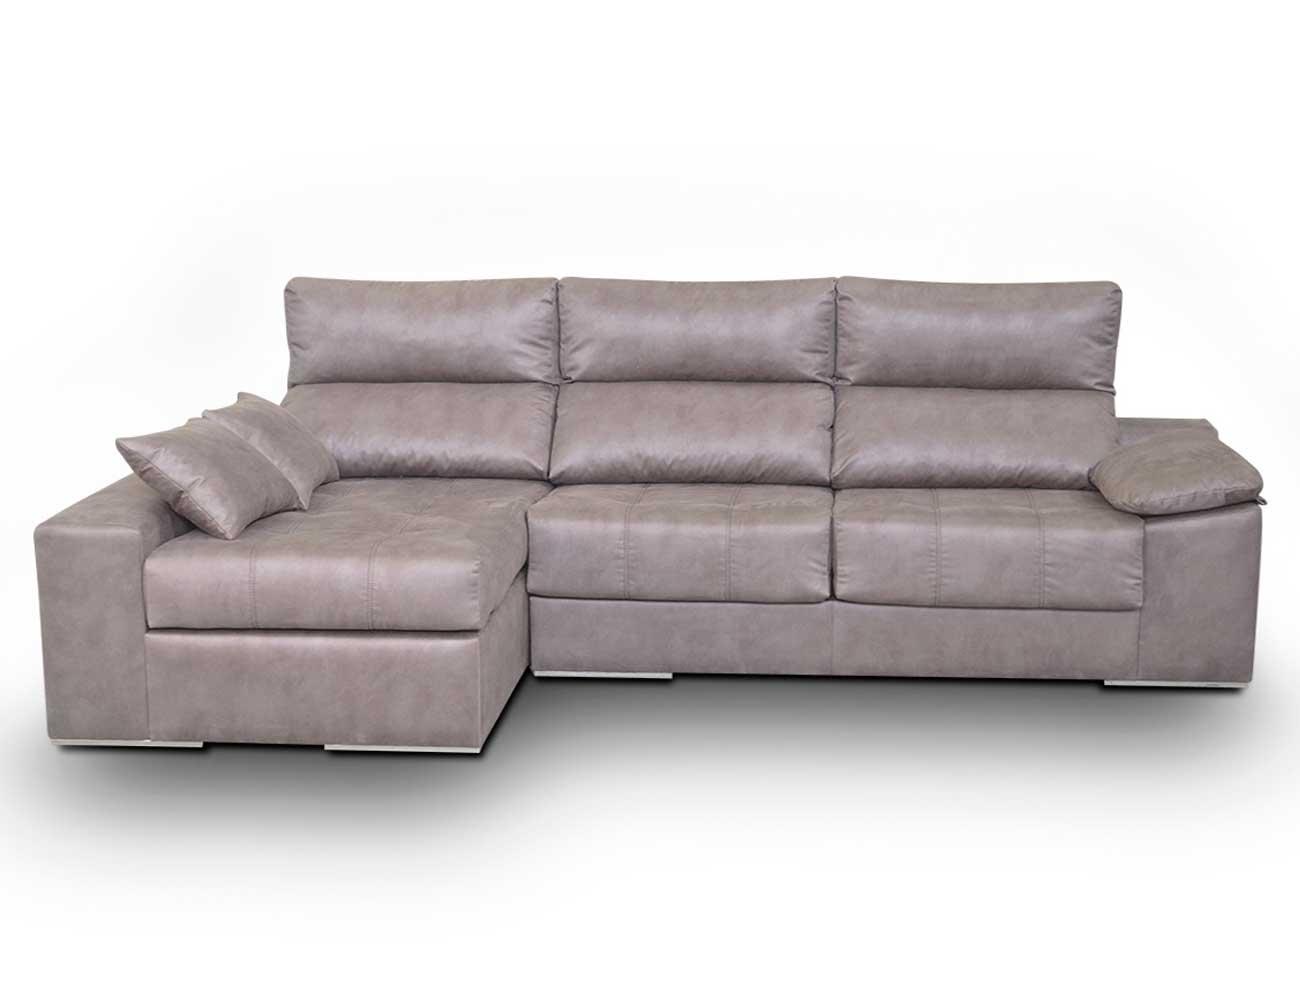 4938_sofa chaiselongue moderno asientos extraibles muy comodo dobles pespuntes donatella10